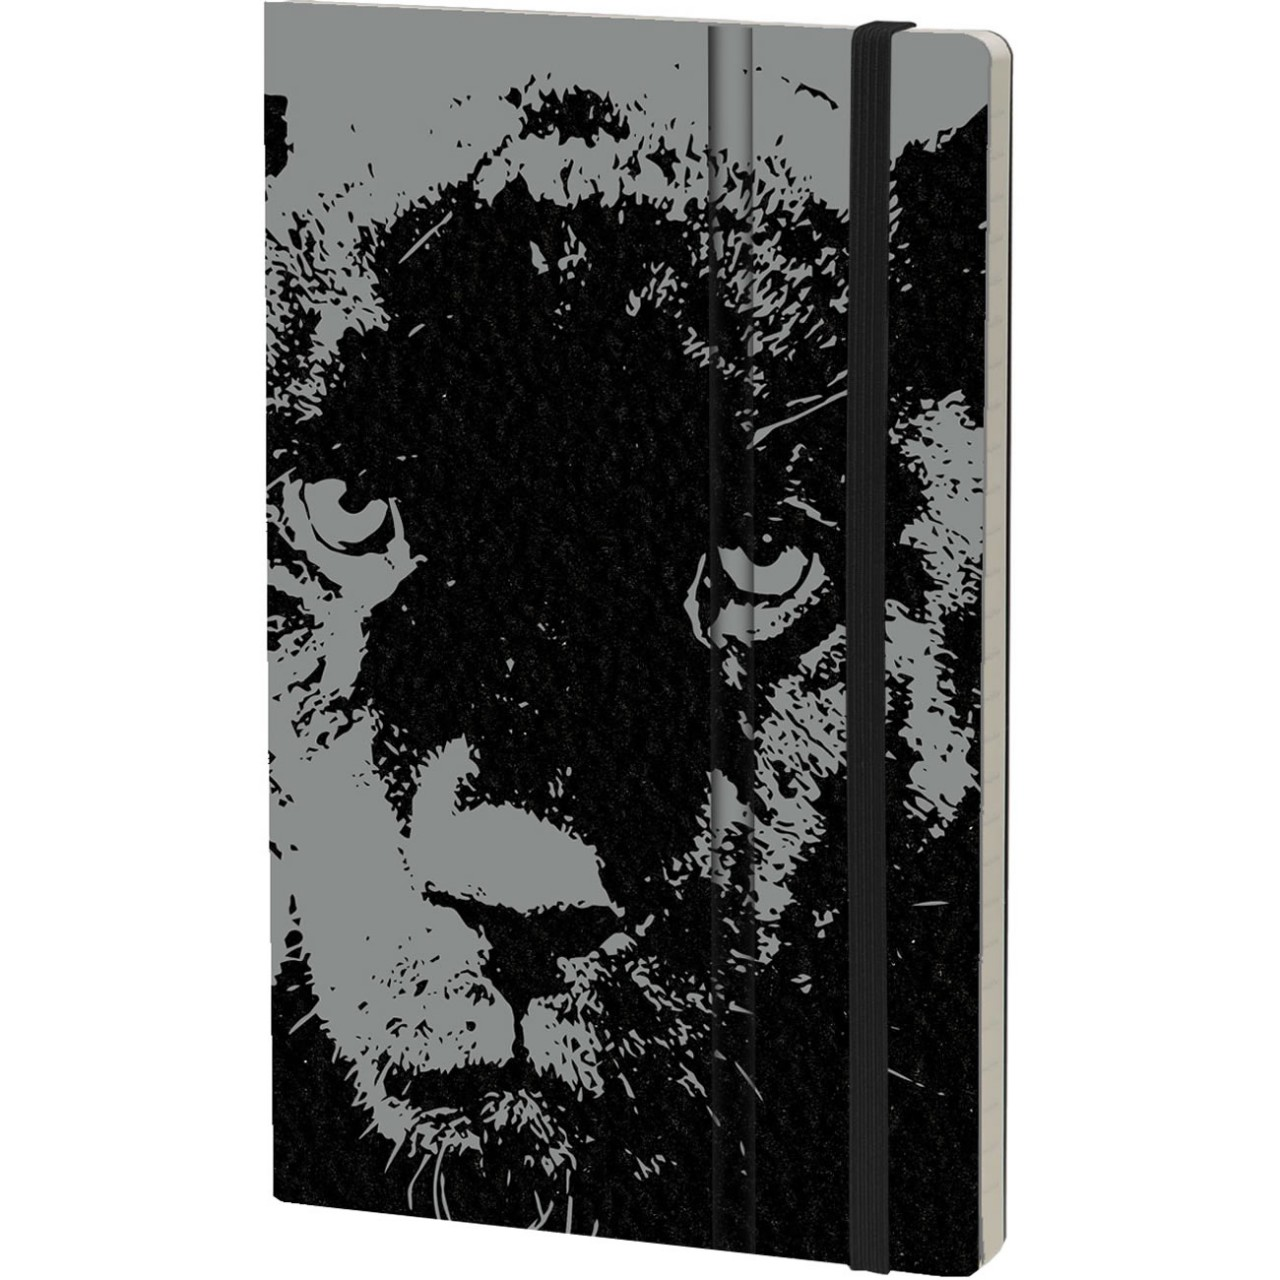 Stifflexible Notizbuch WILD PEARL 13 x 21 cm 192 S., BLACK PANTHER